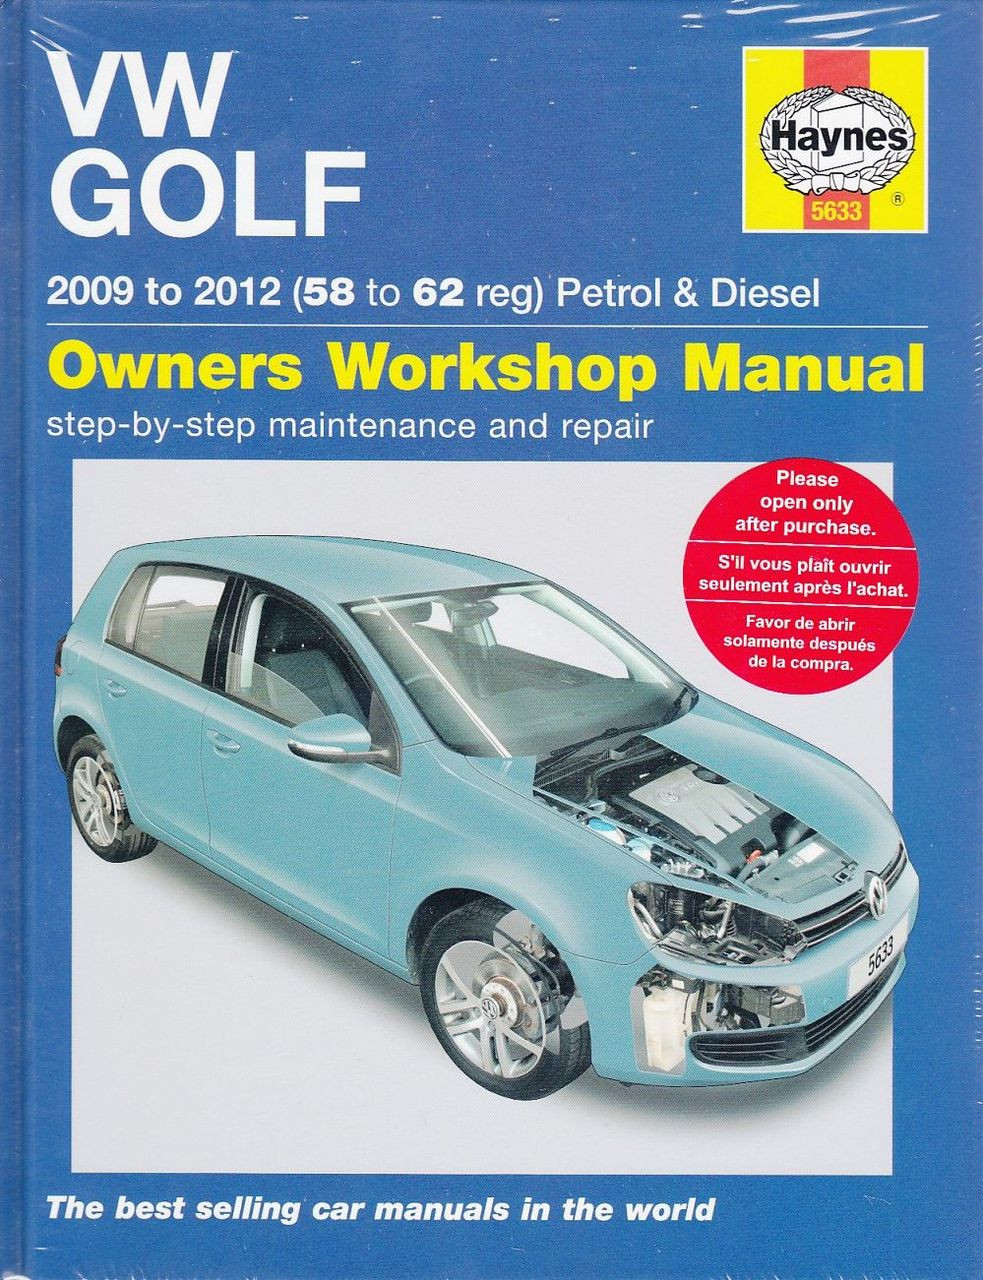 vw golf 2009 2012 petrol diesel repair manual rh automotobookshop com au 2015 VW SportWagen Volkswagen Variant